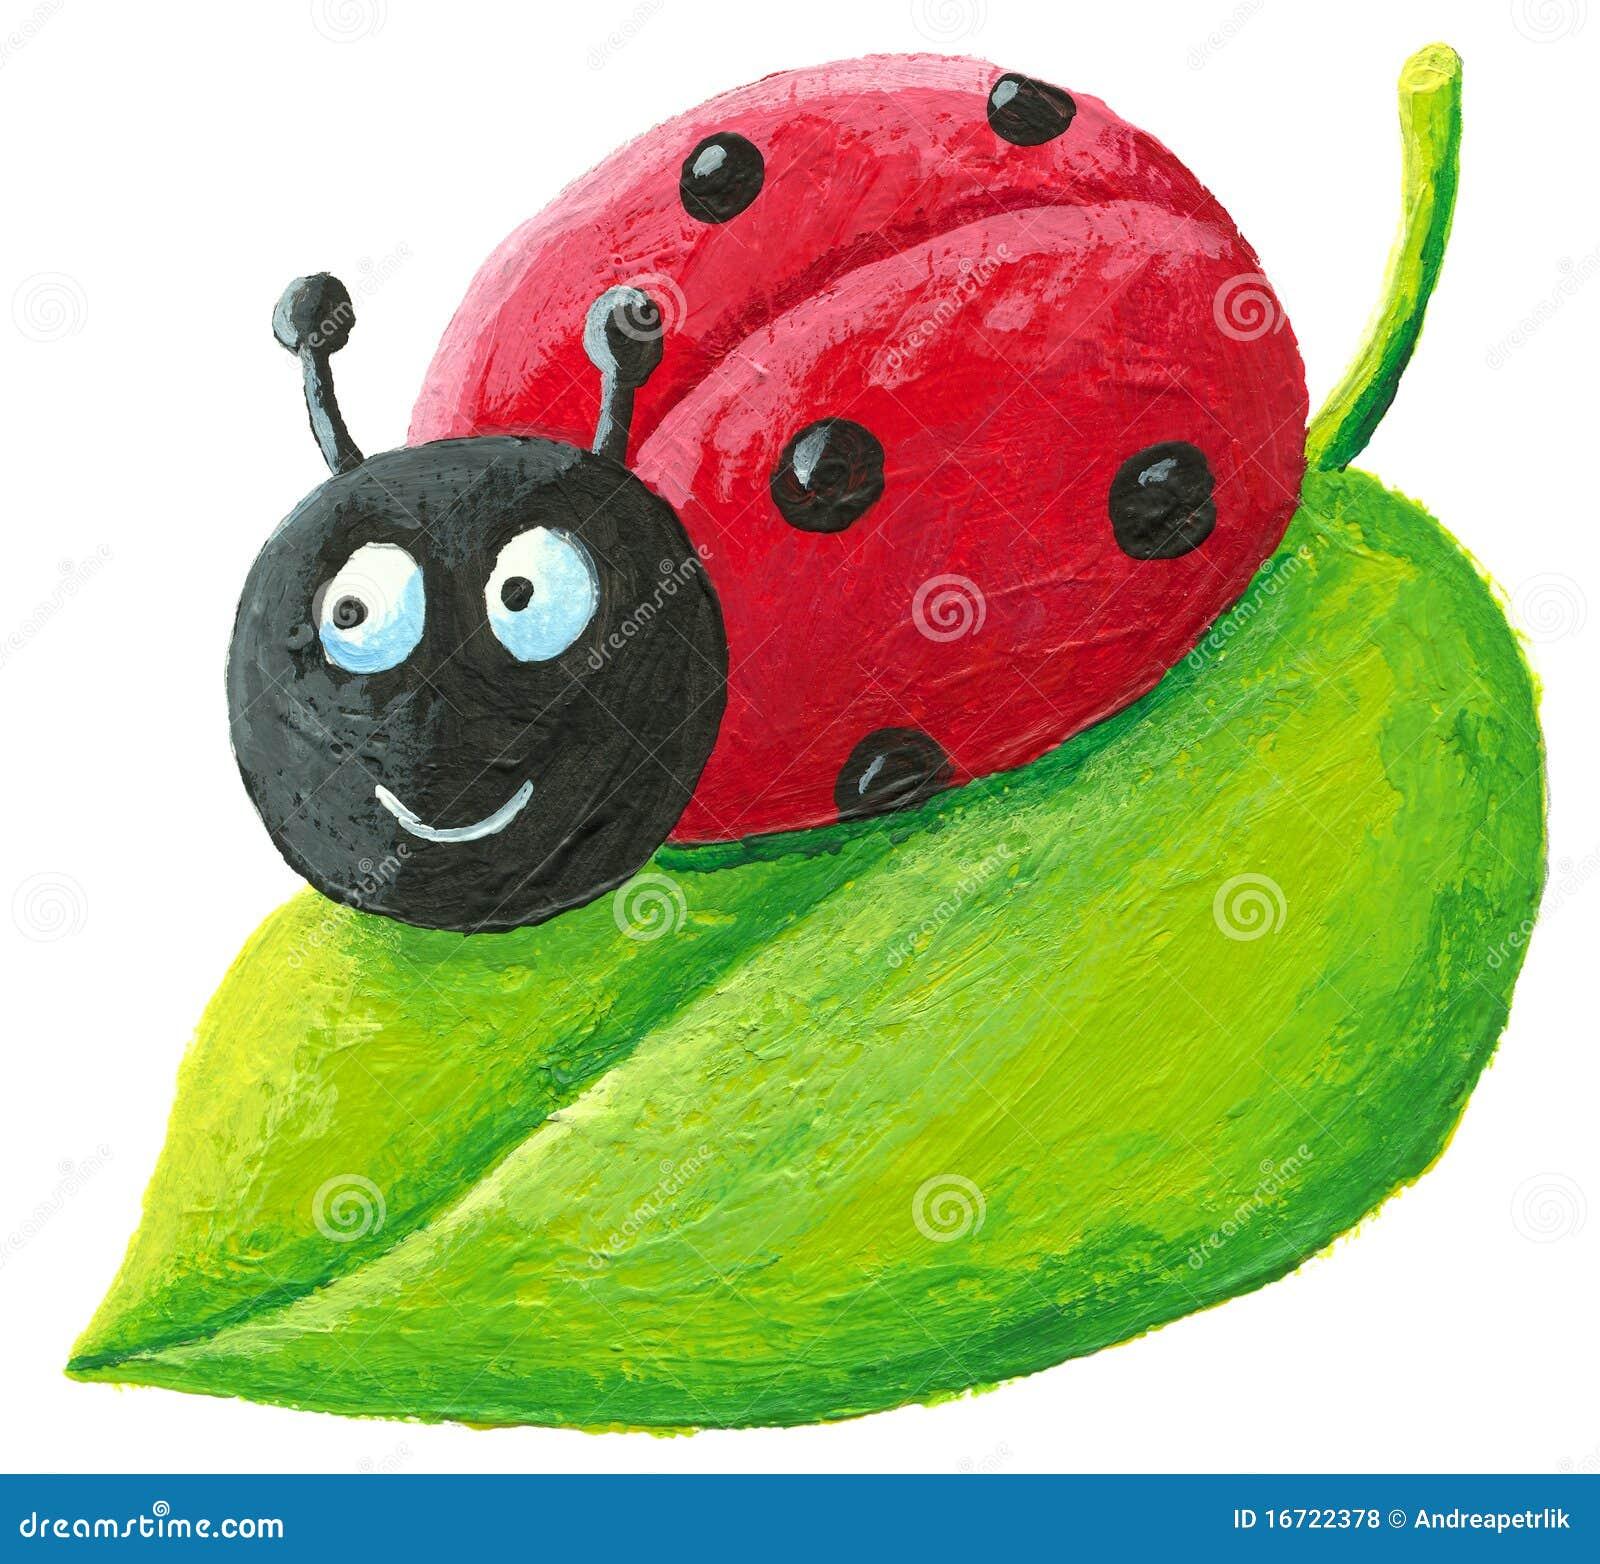 Cute Ladybug Green Leaf Stock Illustrations – 586 Cute Ladybug Green ... for Clipart Ladybug On Leaf  34eri